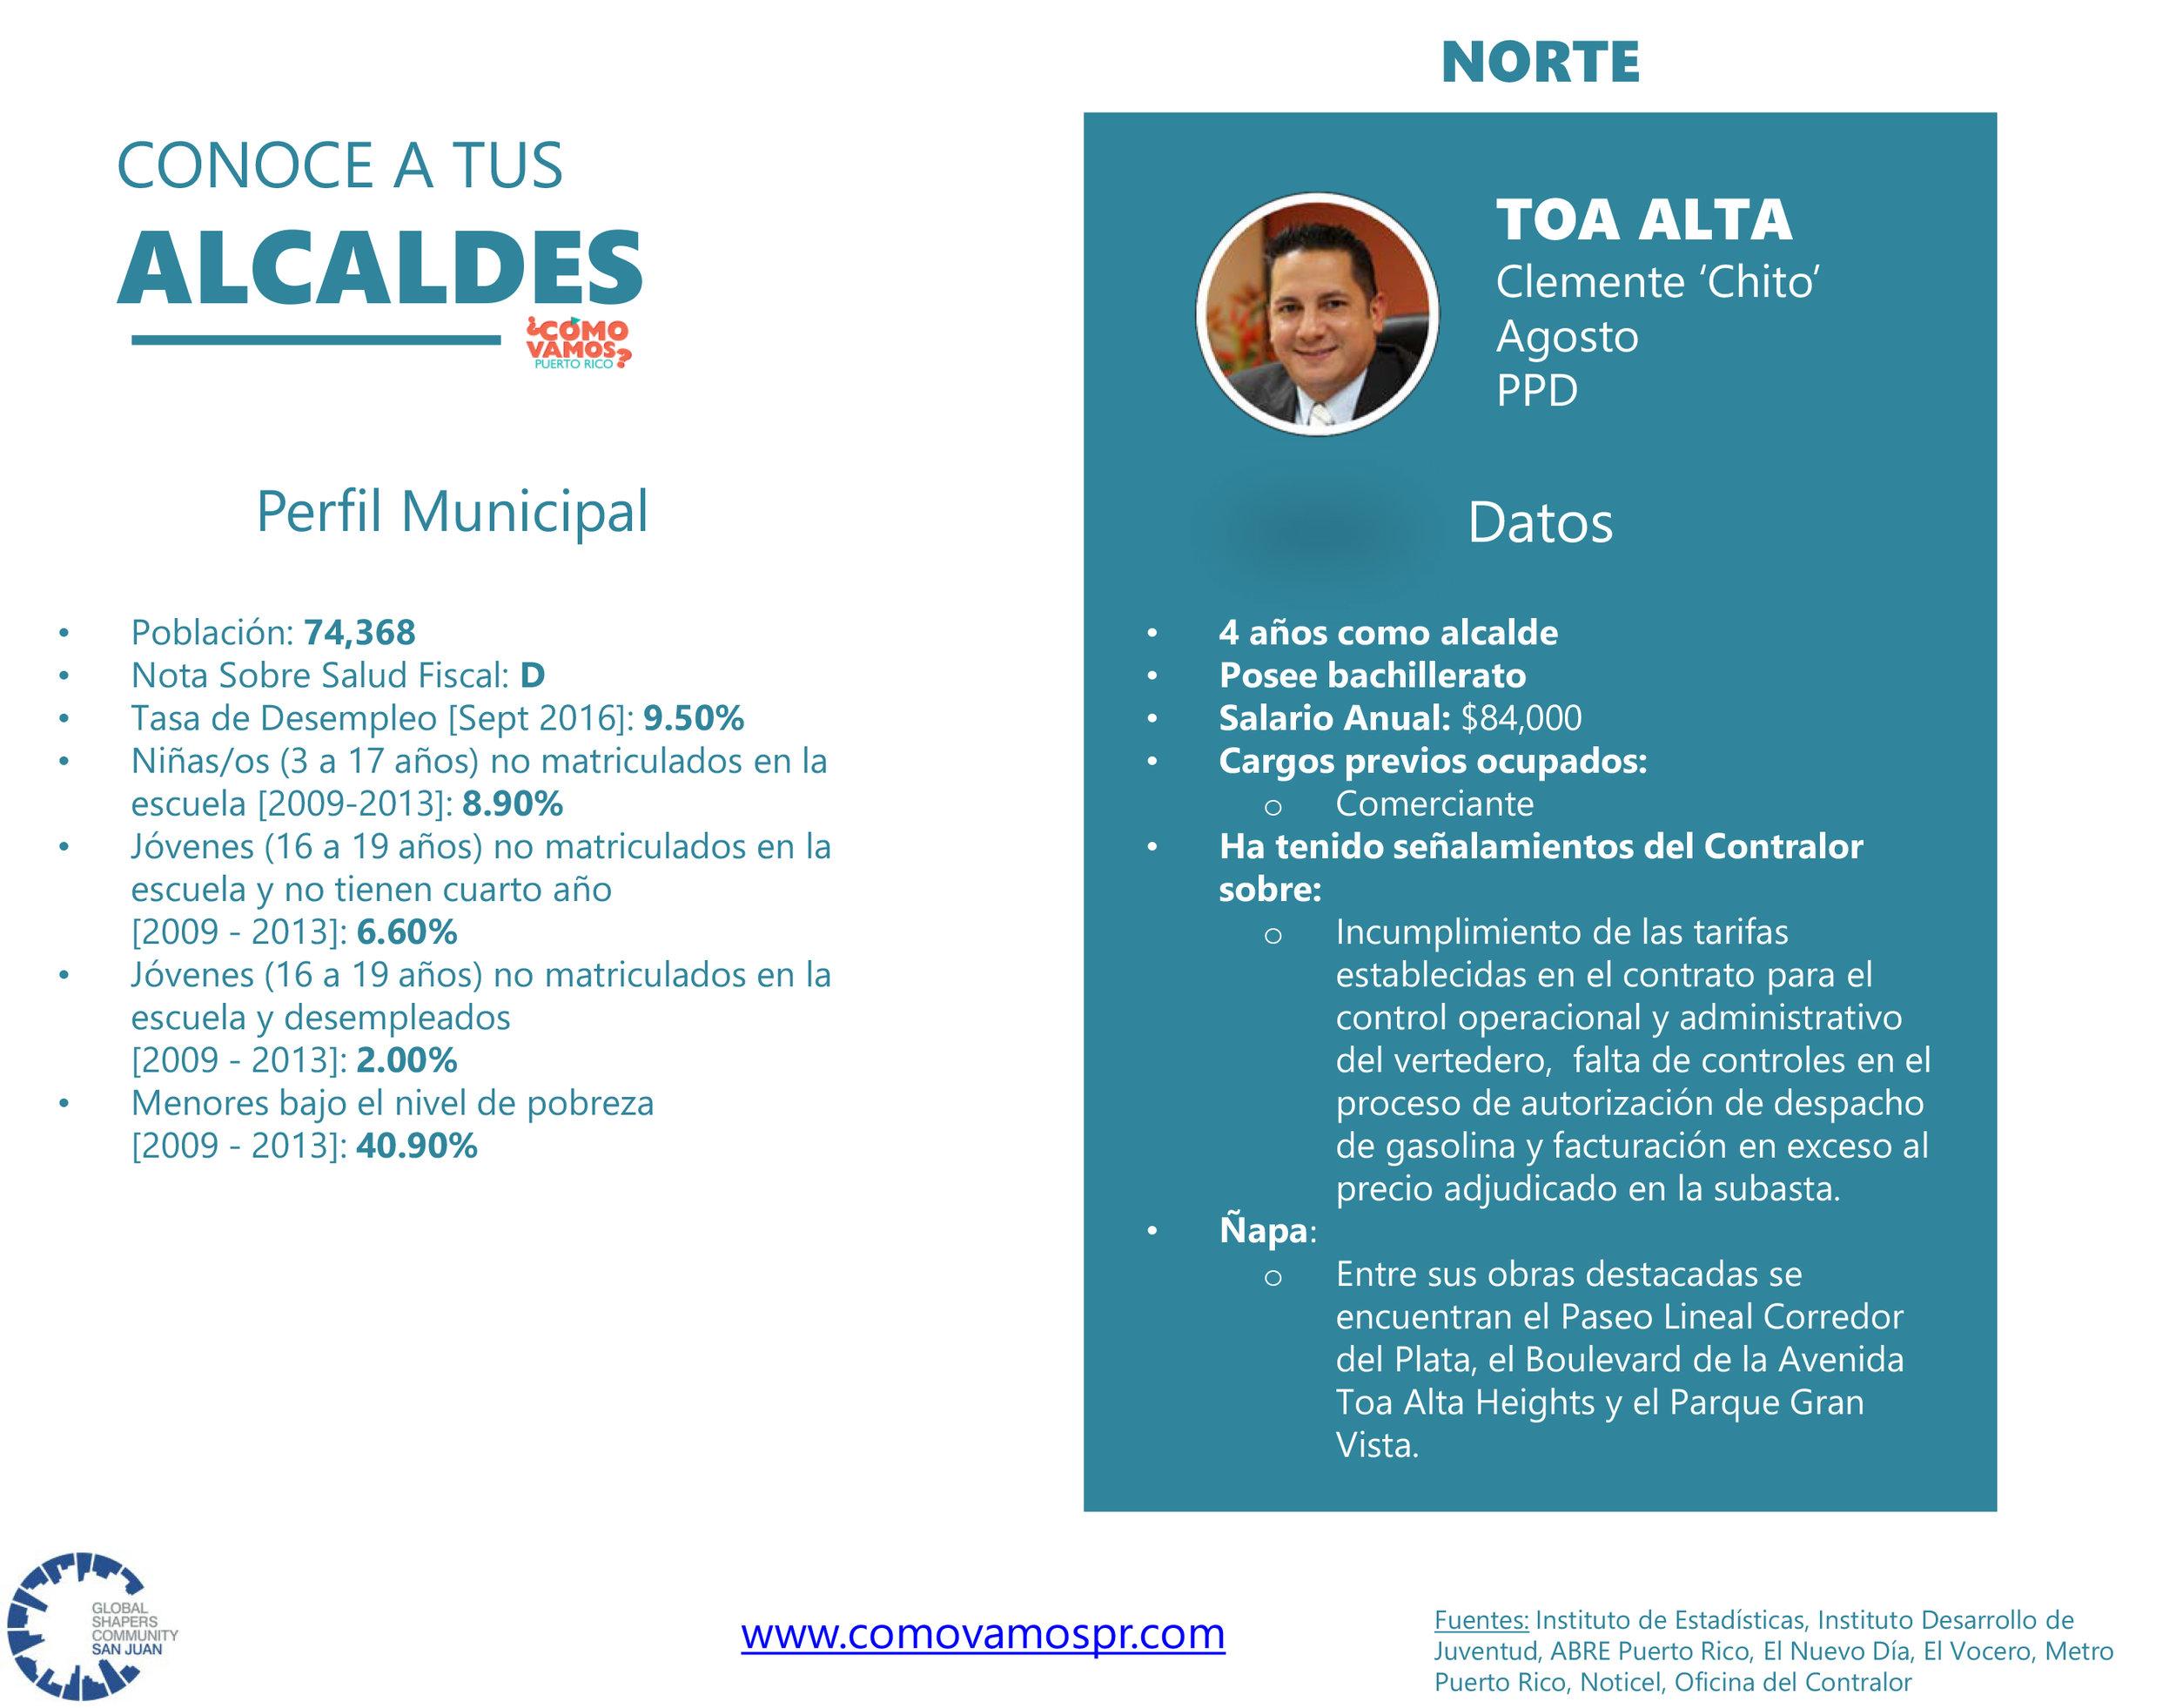 Alcaldes_Norte_ToaAlta.jpg